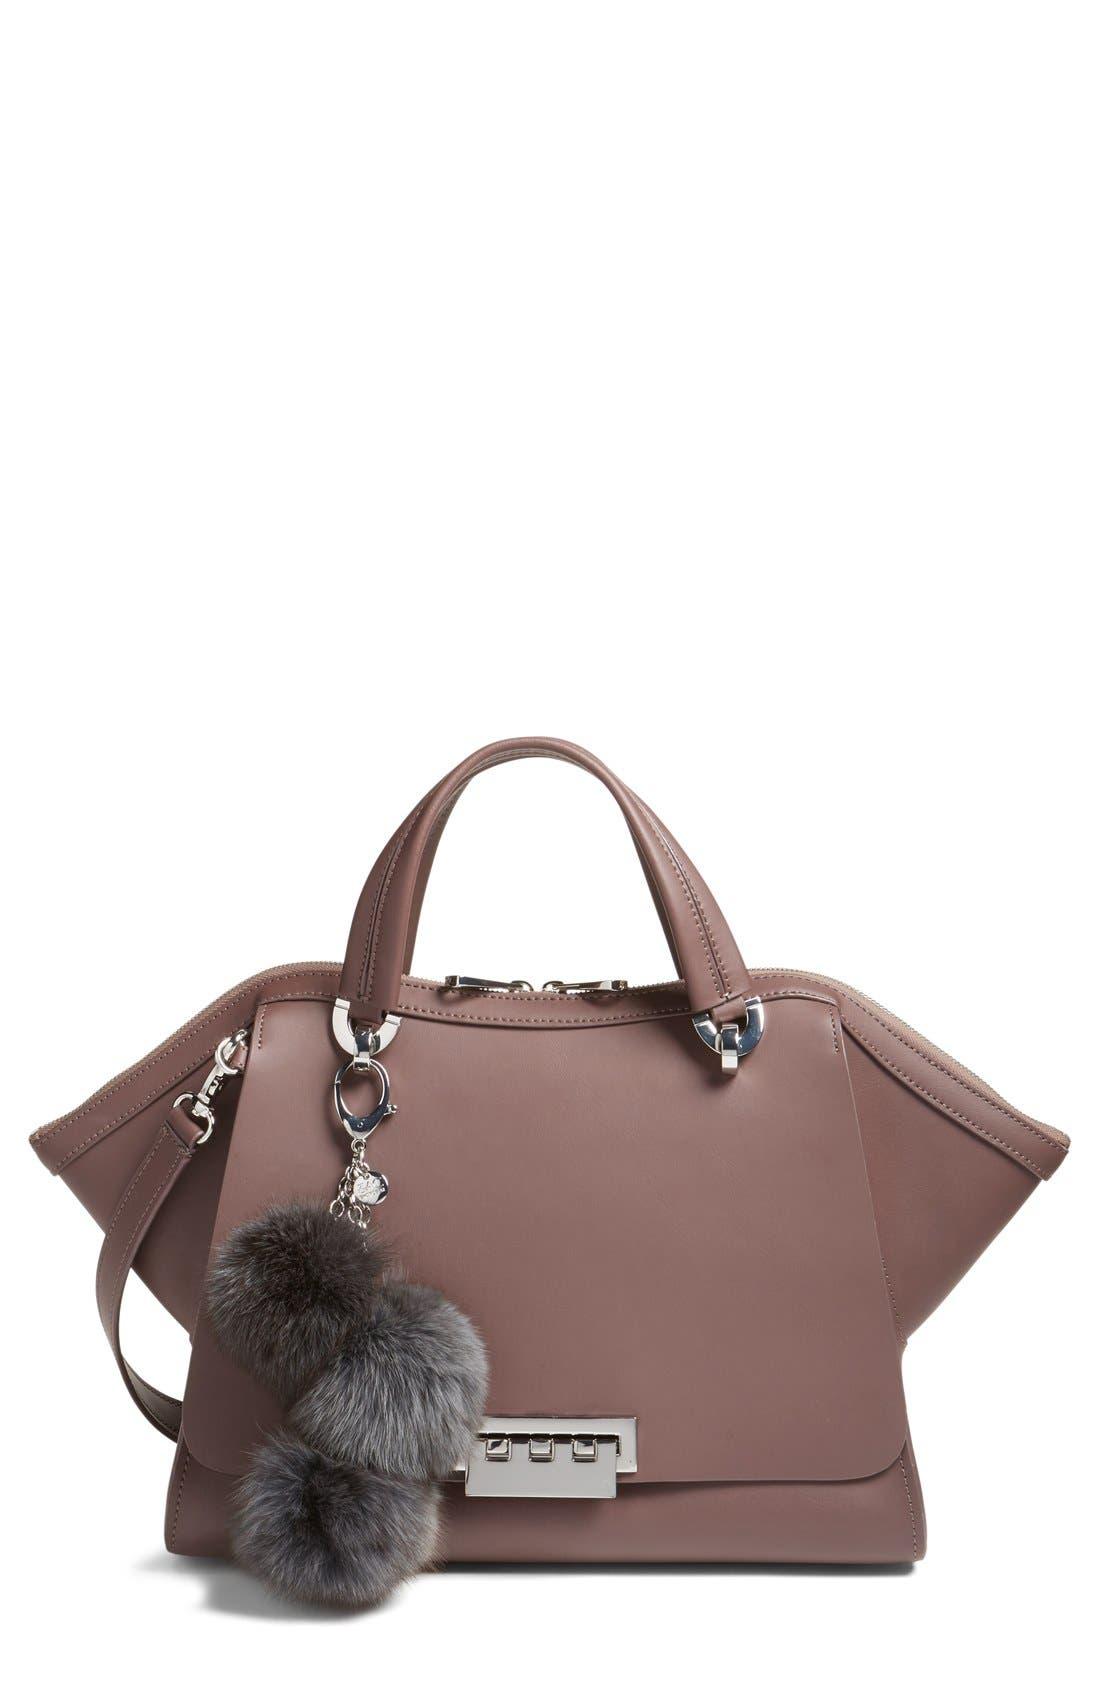 Alternate Image 1 Selected - ZAC Zac Posen Jumbo Eartha Iconic Leather Satchel with Genuine Fox Fur Bag Charm